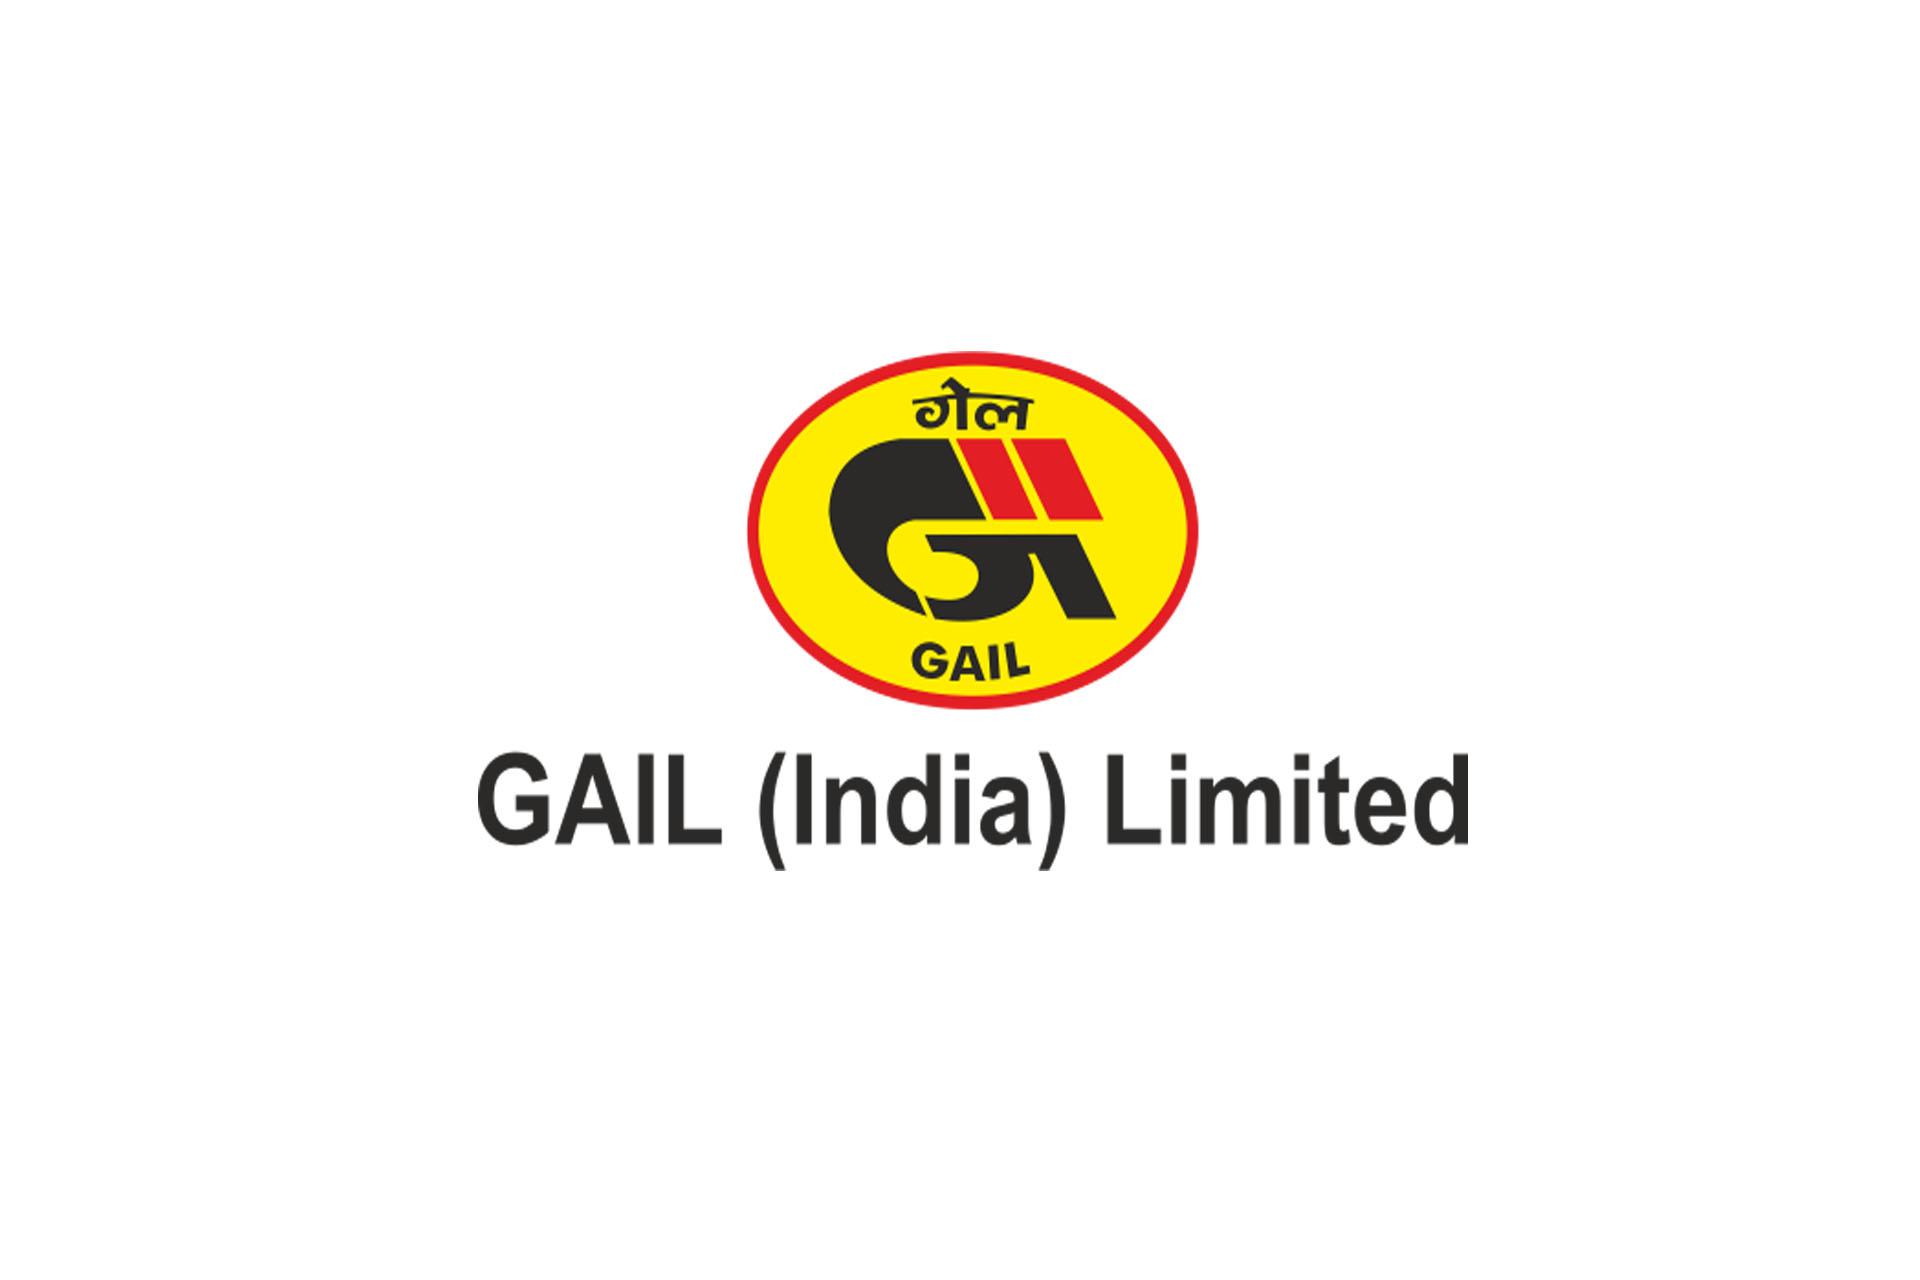 GAIL India Hiring Graduate Engineers as Executive Trainees